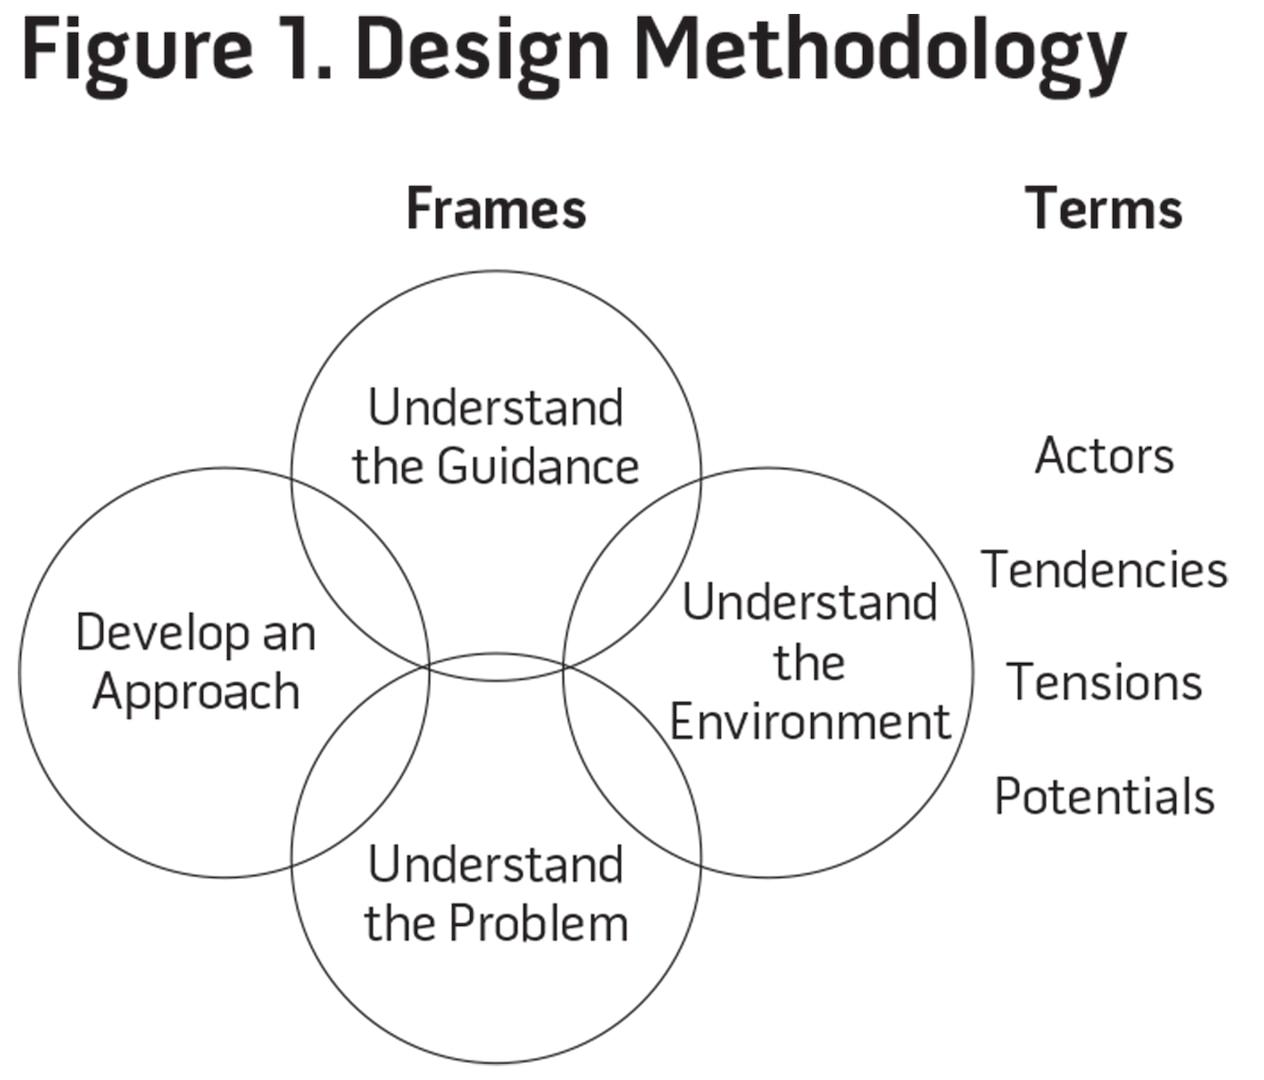 Figure 1. Design Methodology